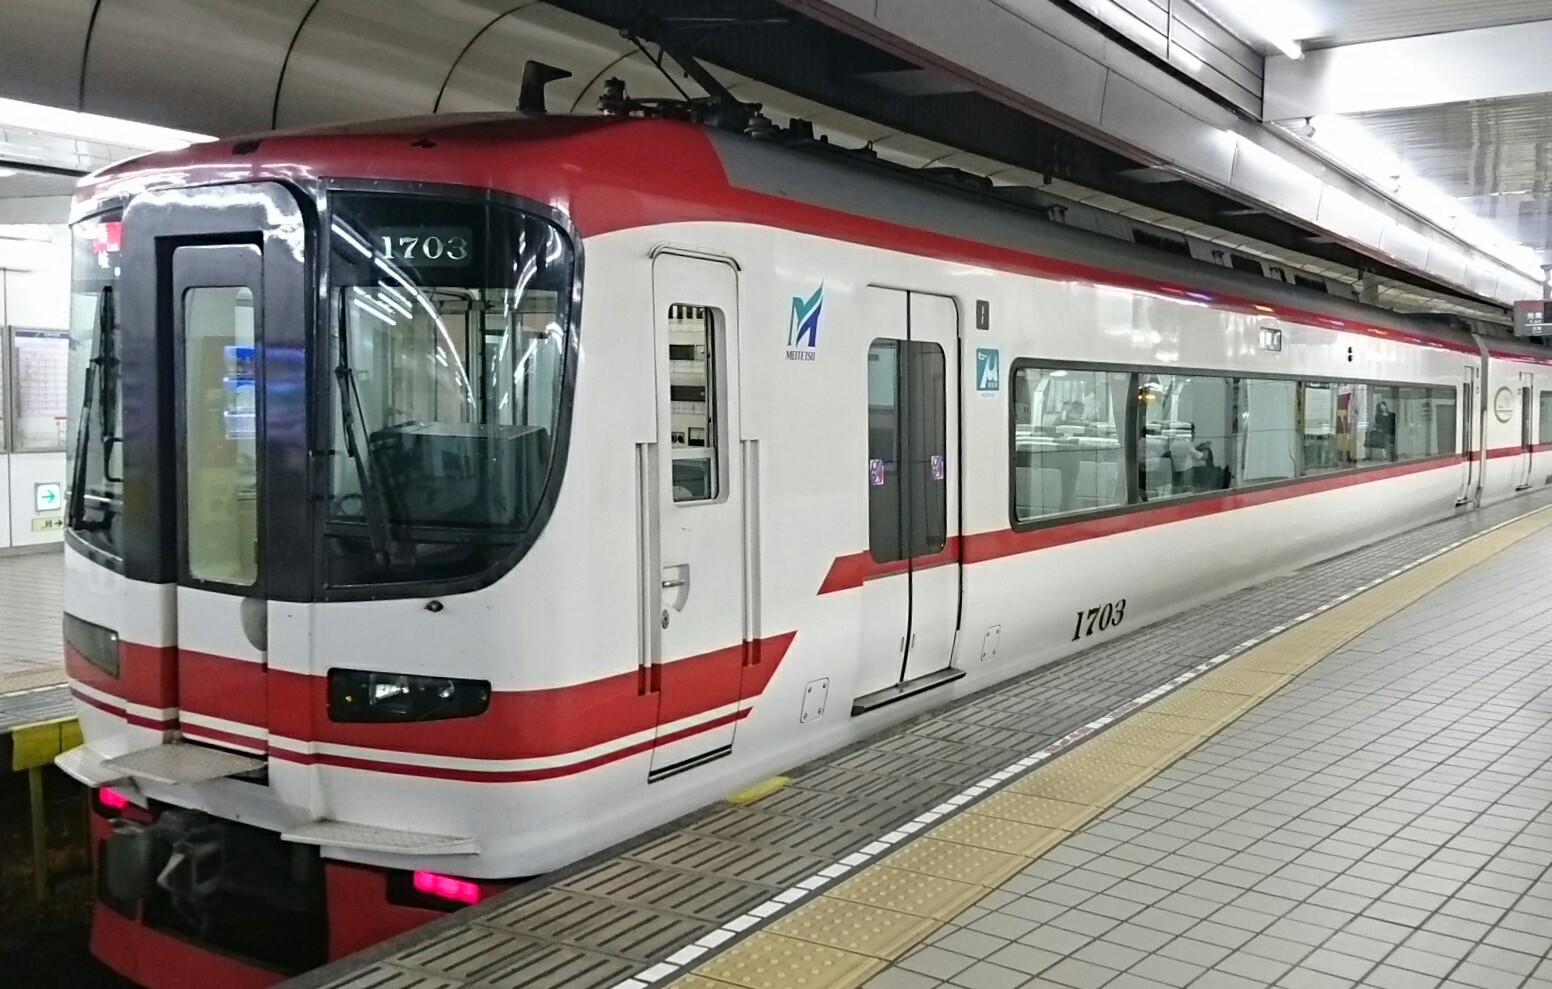 20177.12 名古屋 (11) 名古屋 -  岐阜いき特急